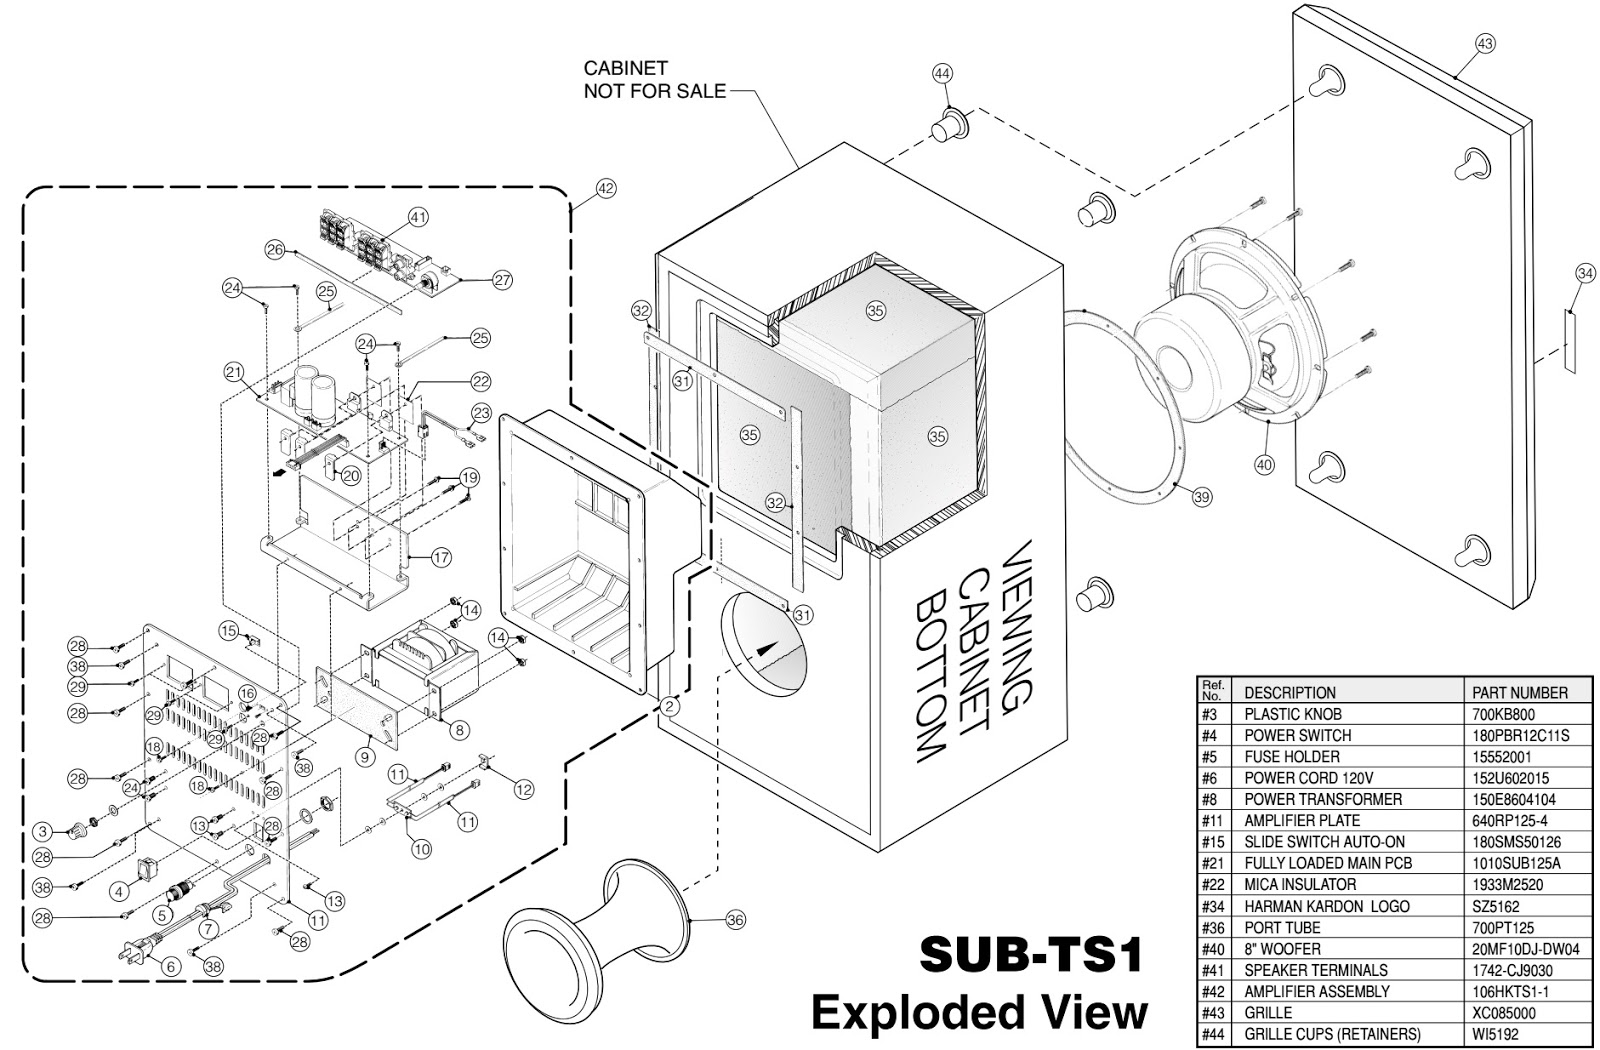 harman kardon sub-ts1  u2013 amplifier sub-woofer  u2013 schematic  u2013 exploded view